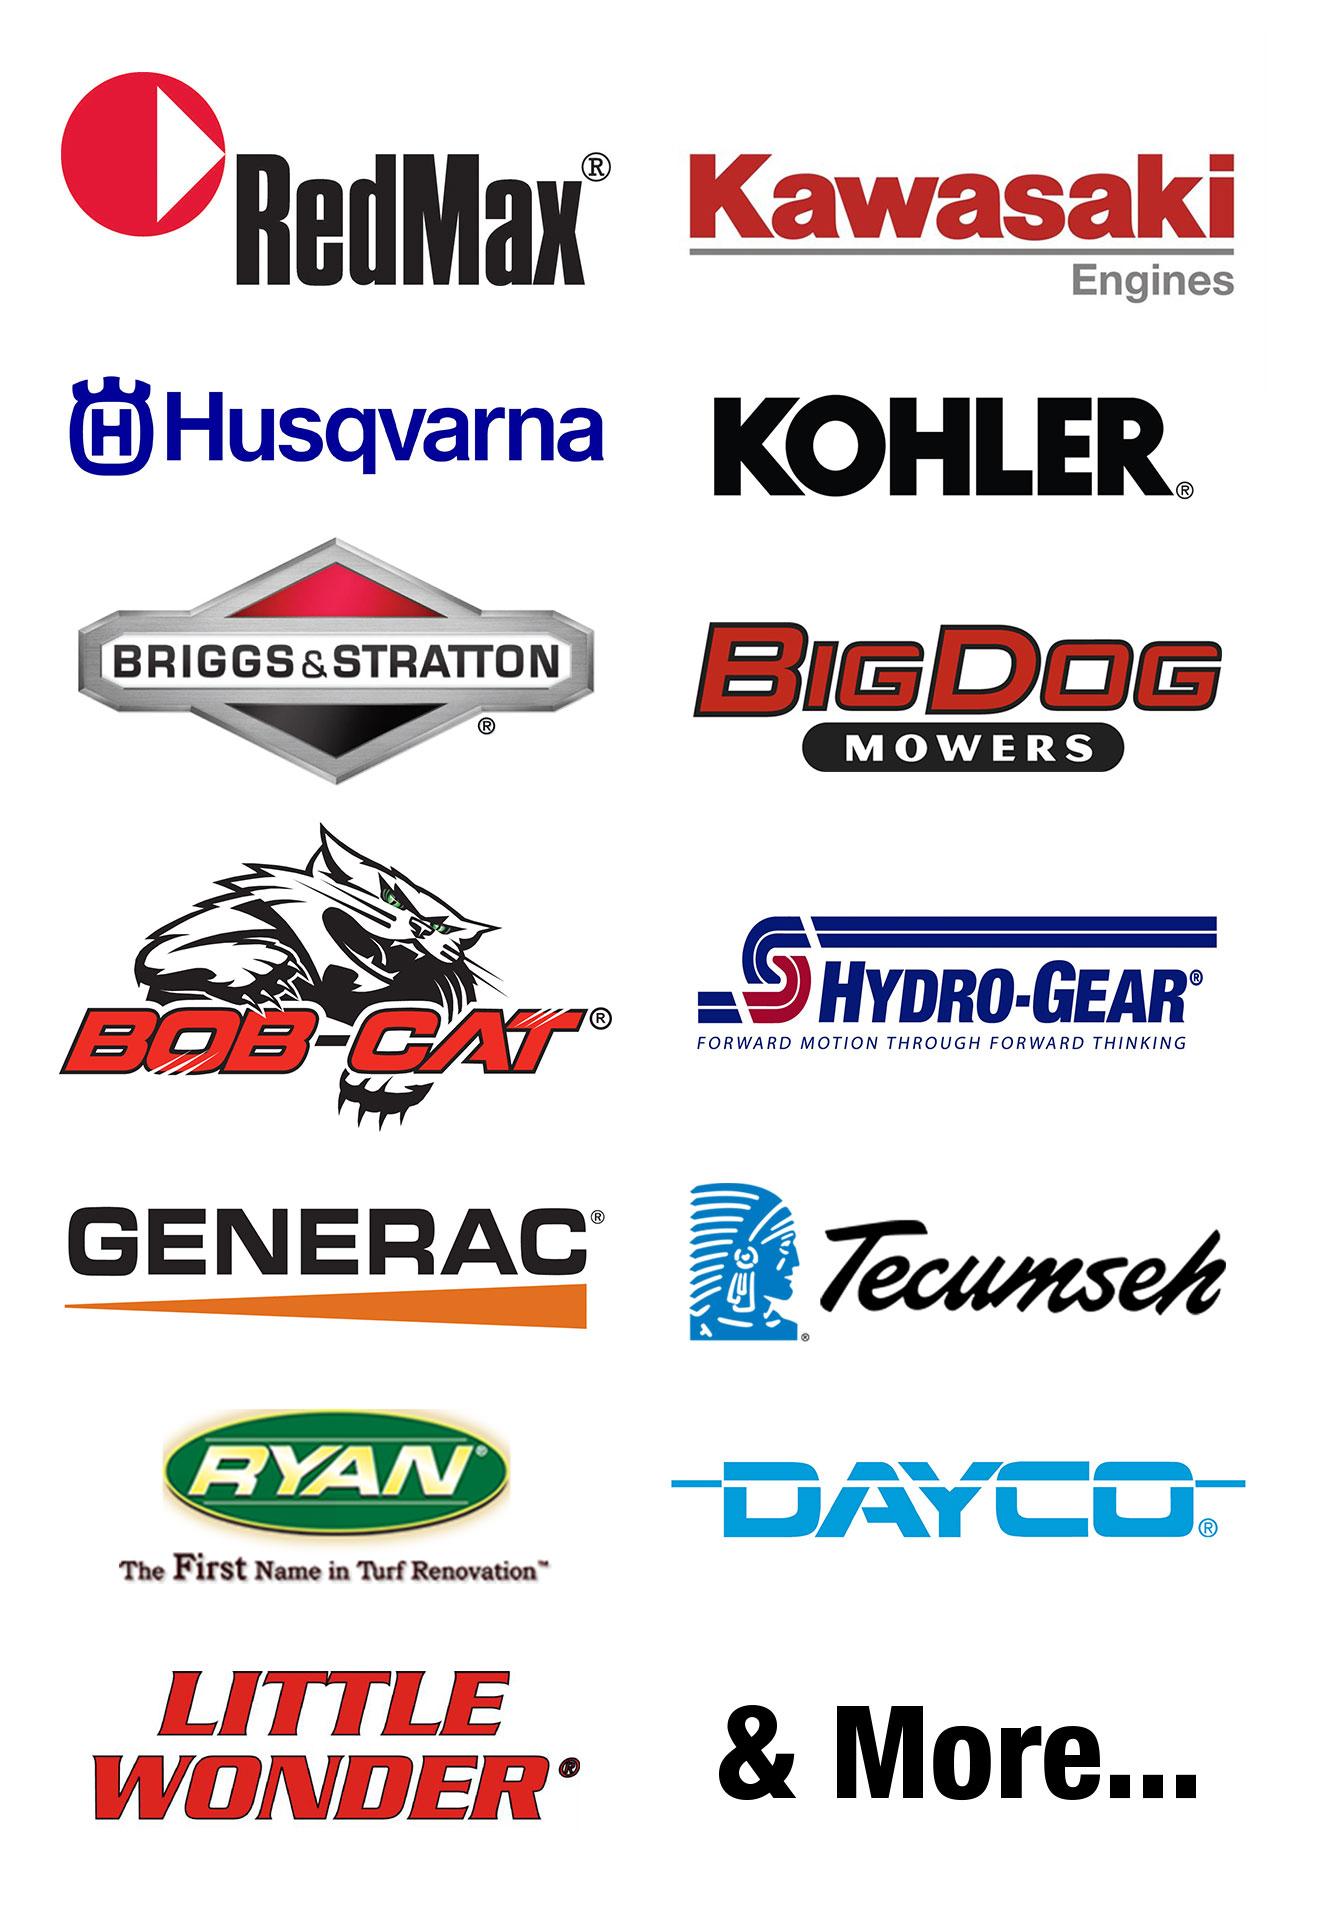 Lawnmowersrus-logos